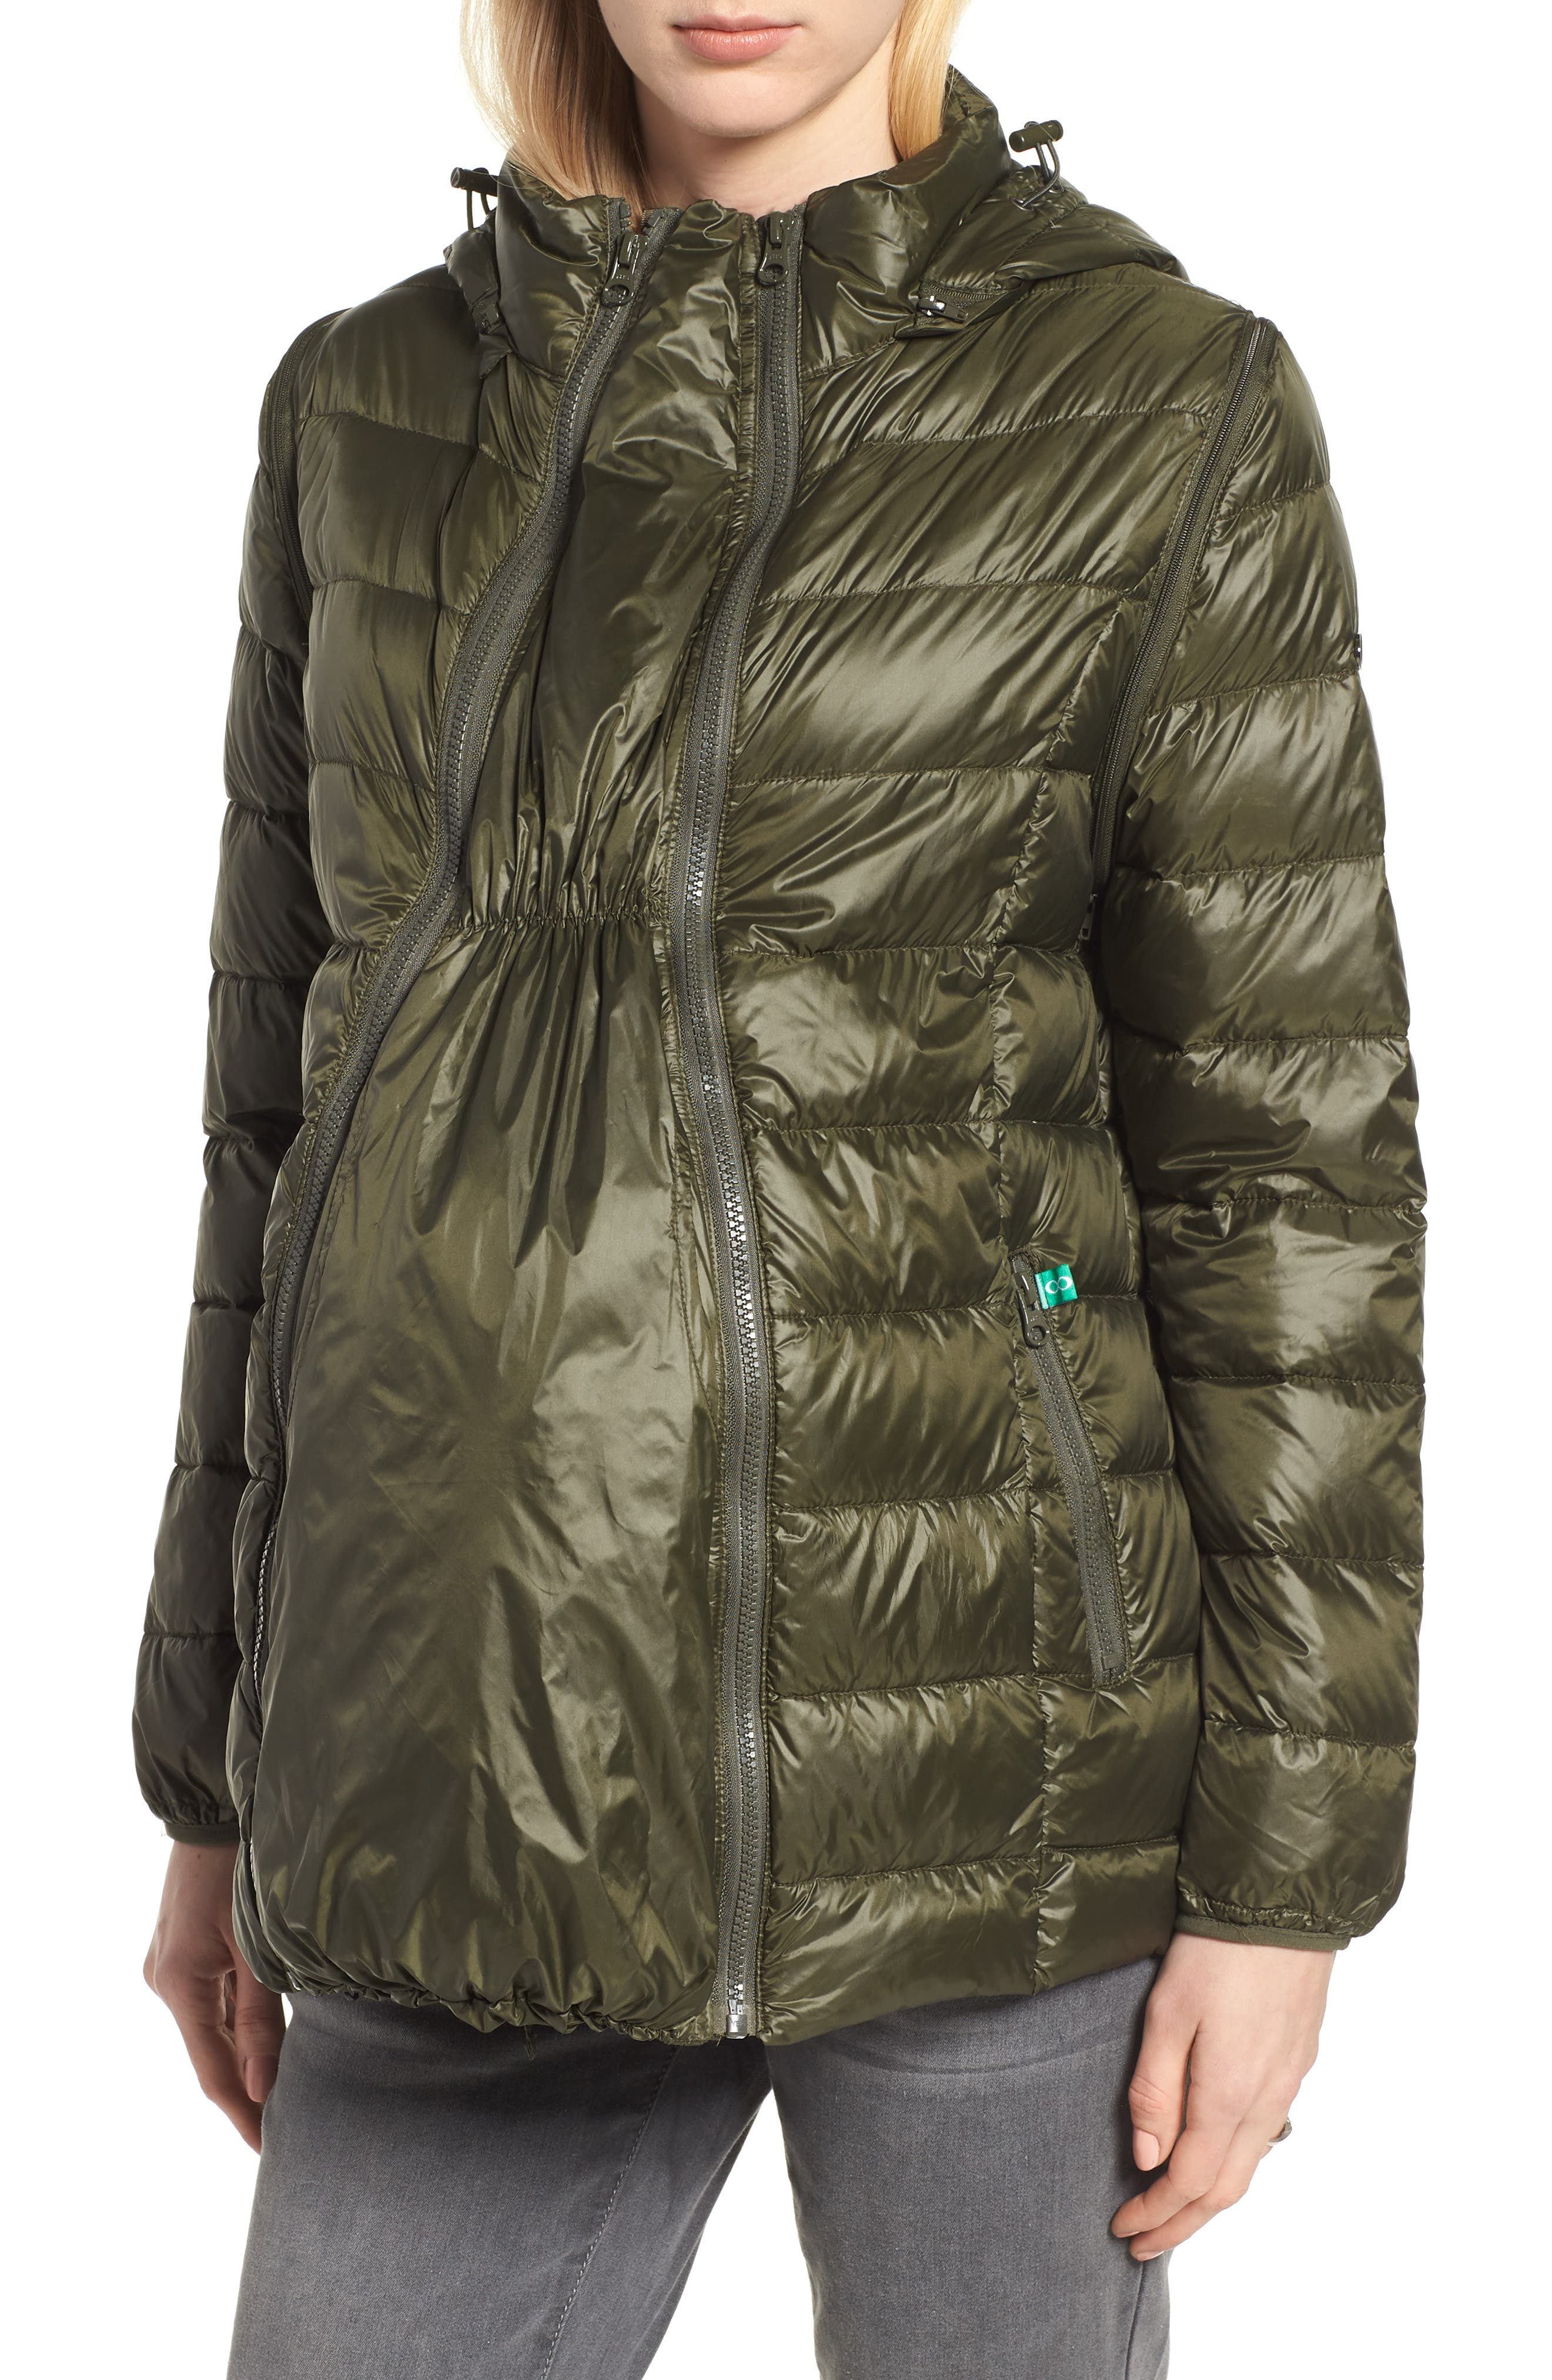 Lightweight Puffer Convertible 3-in-1 Maternity Jacket,                         Main,                         color, Khaki Green